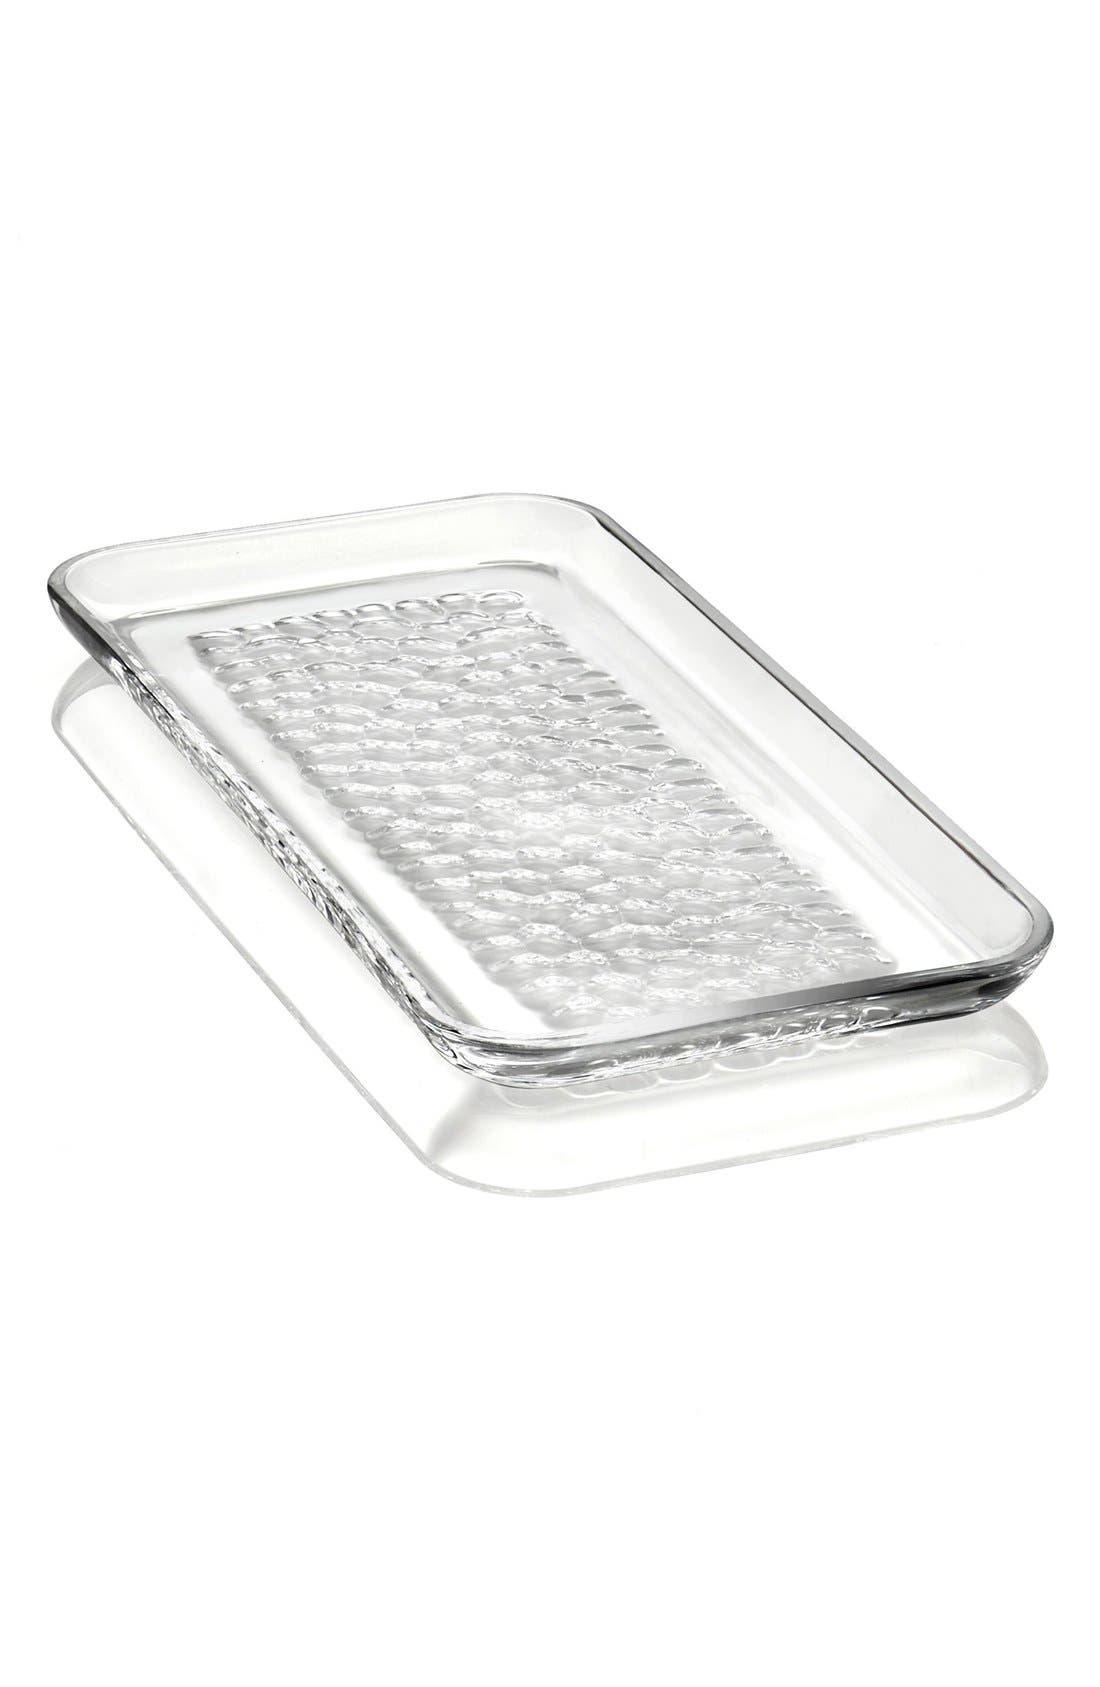 Alternate Image 1 Selected - Orrefors 'Pearl' Rectangular Lead Crystal Platter